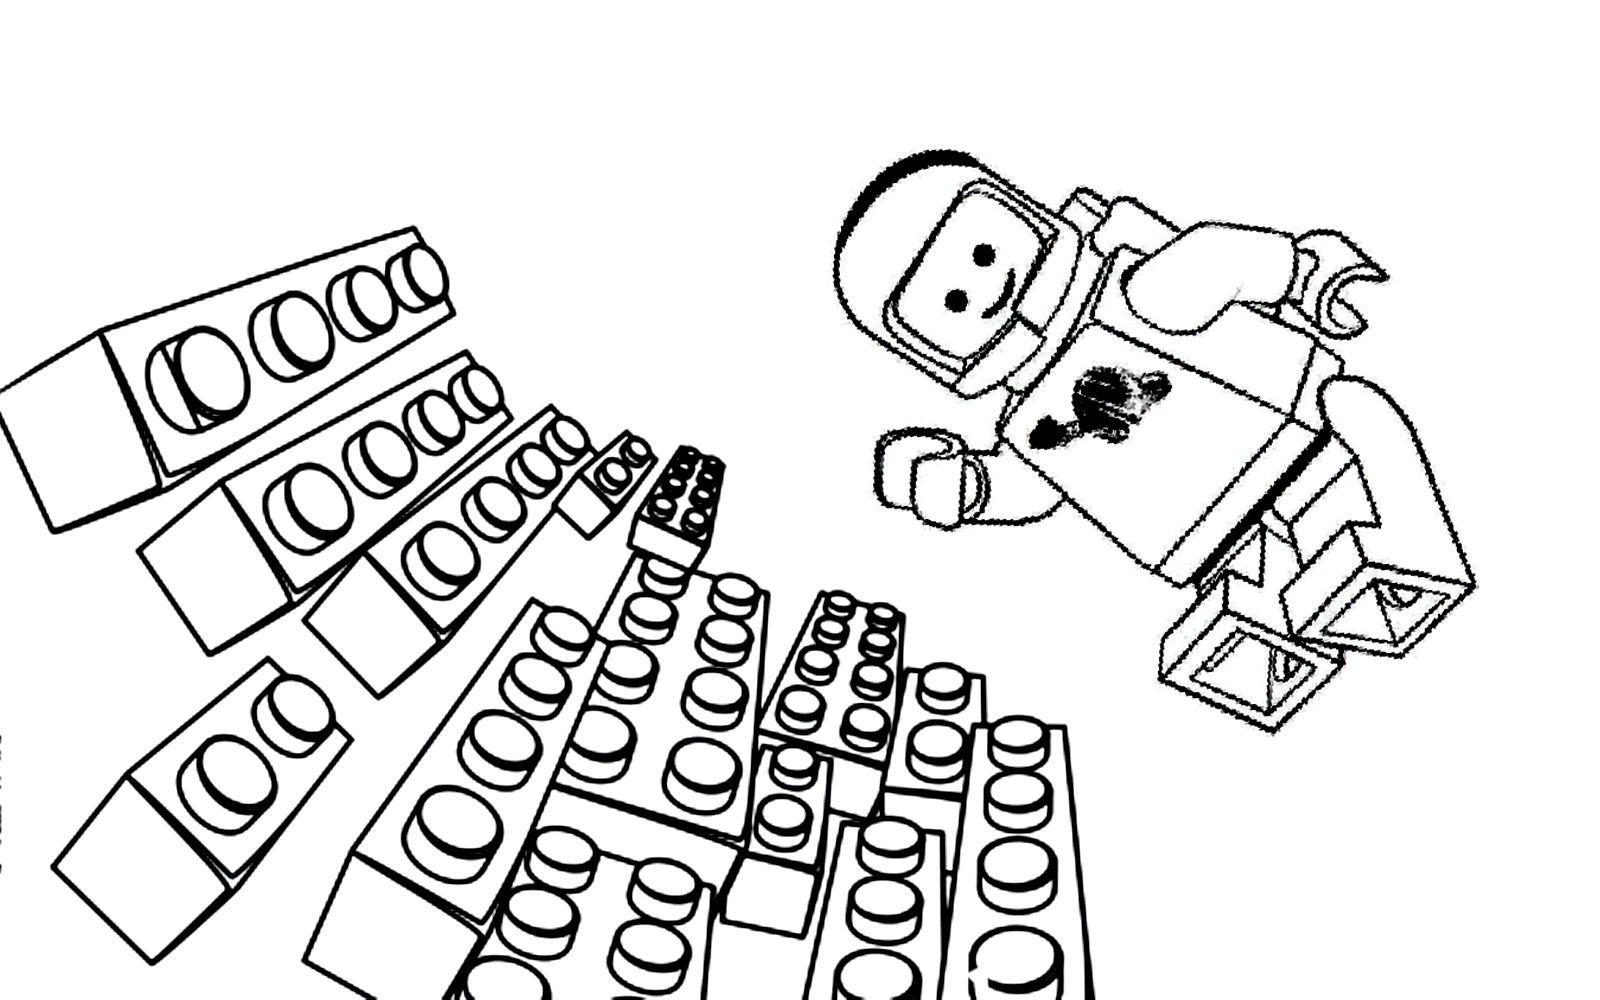 Aventure Lego Astronaute | Coloriage La Grande Aventure Lego concernant Coloriage Astronaute